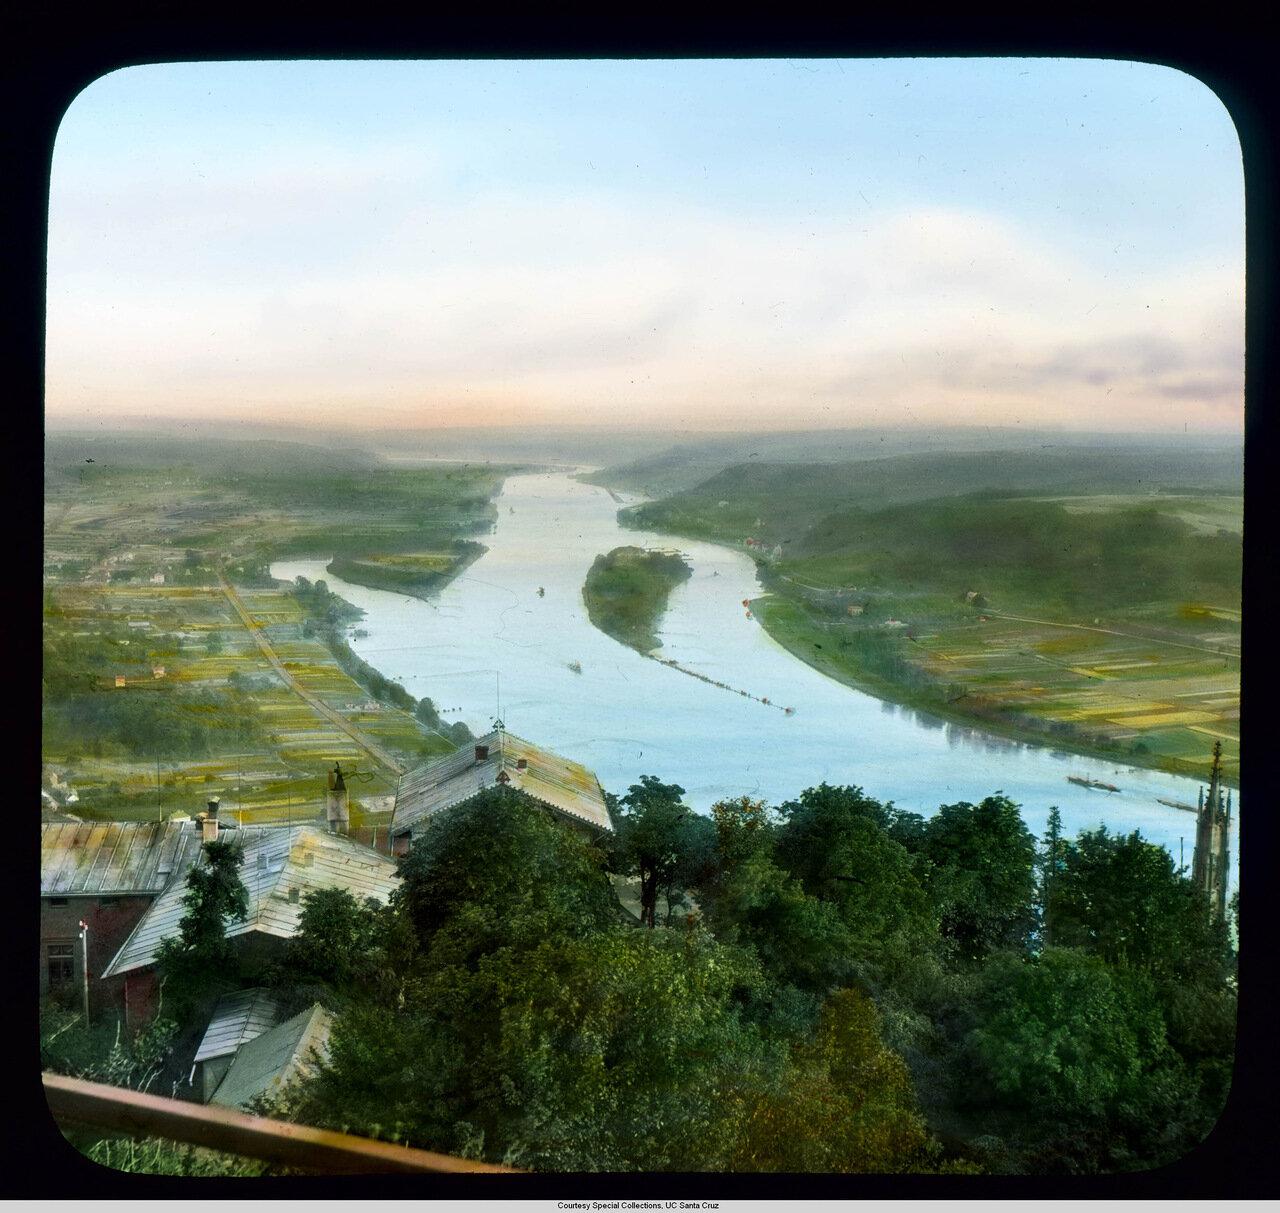 Рейнская долина.  Панорама с горы Драхенфельс